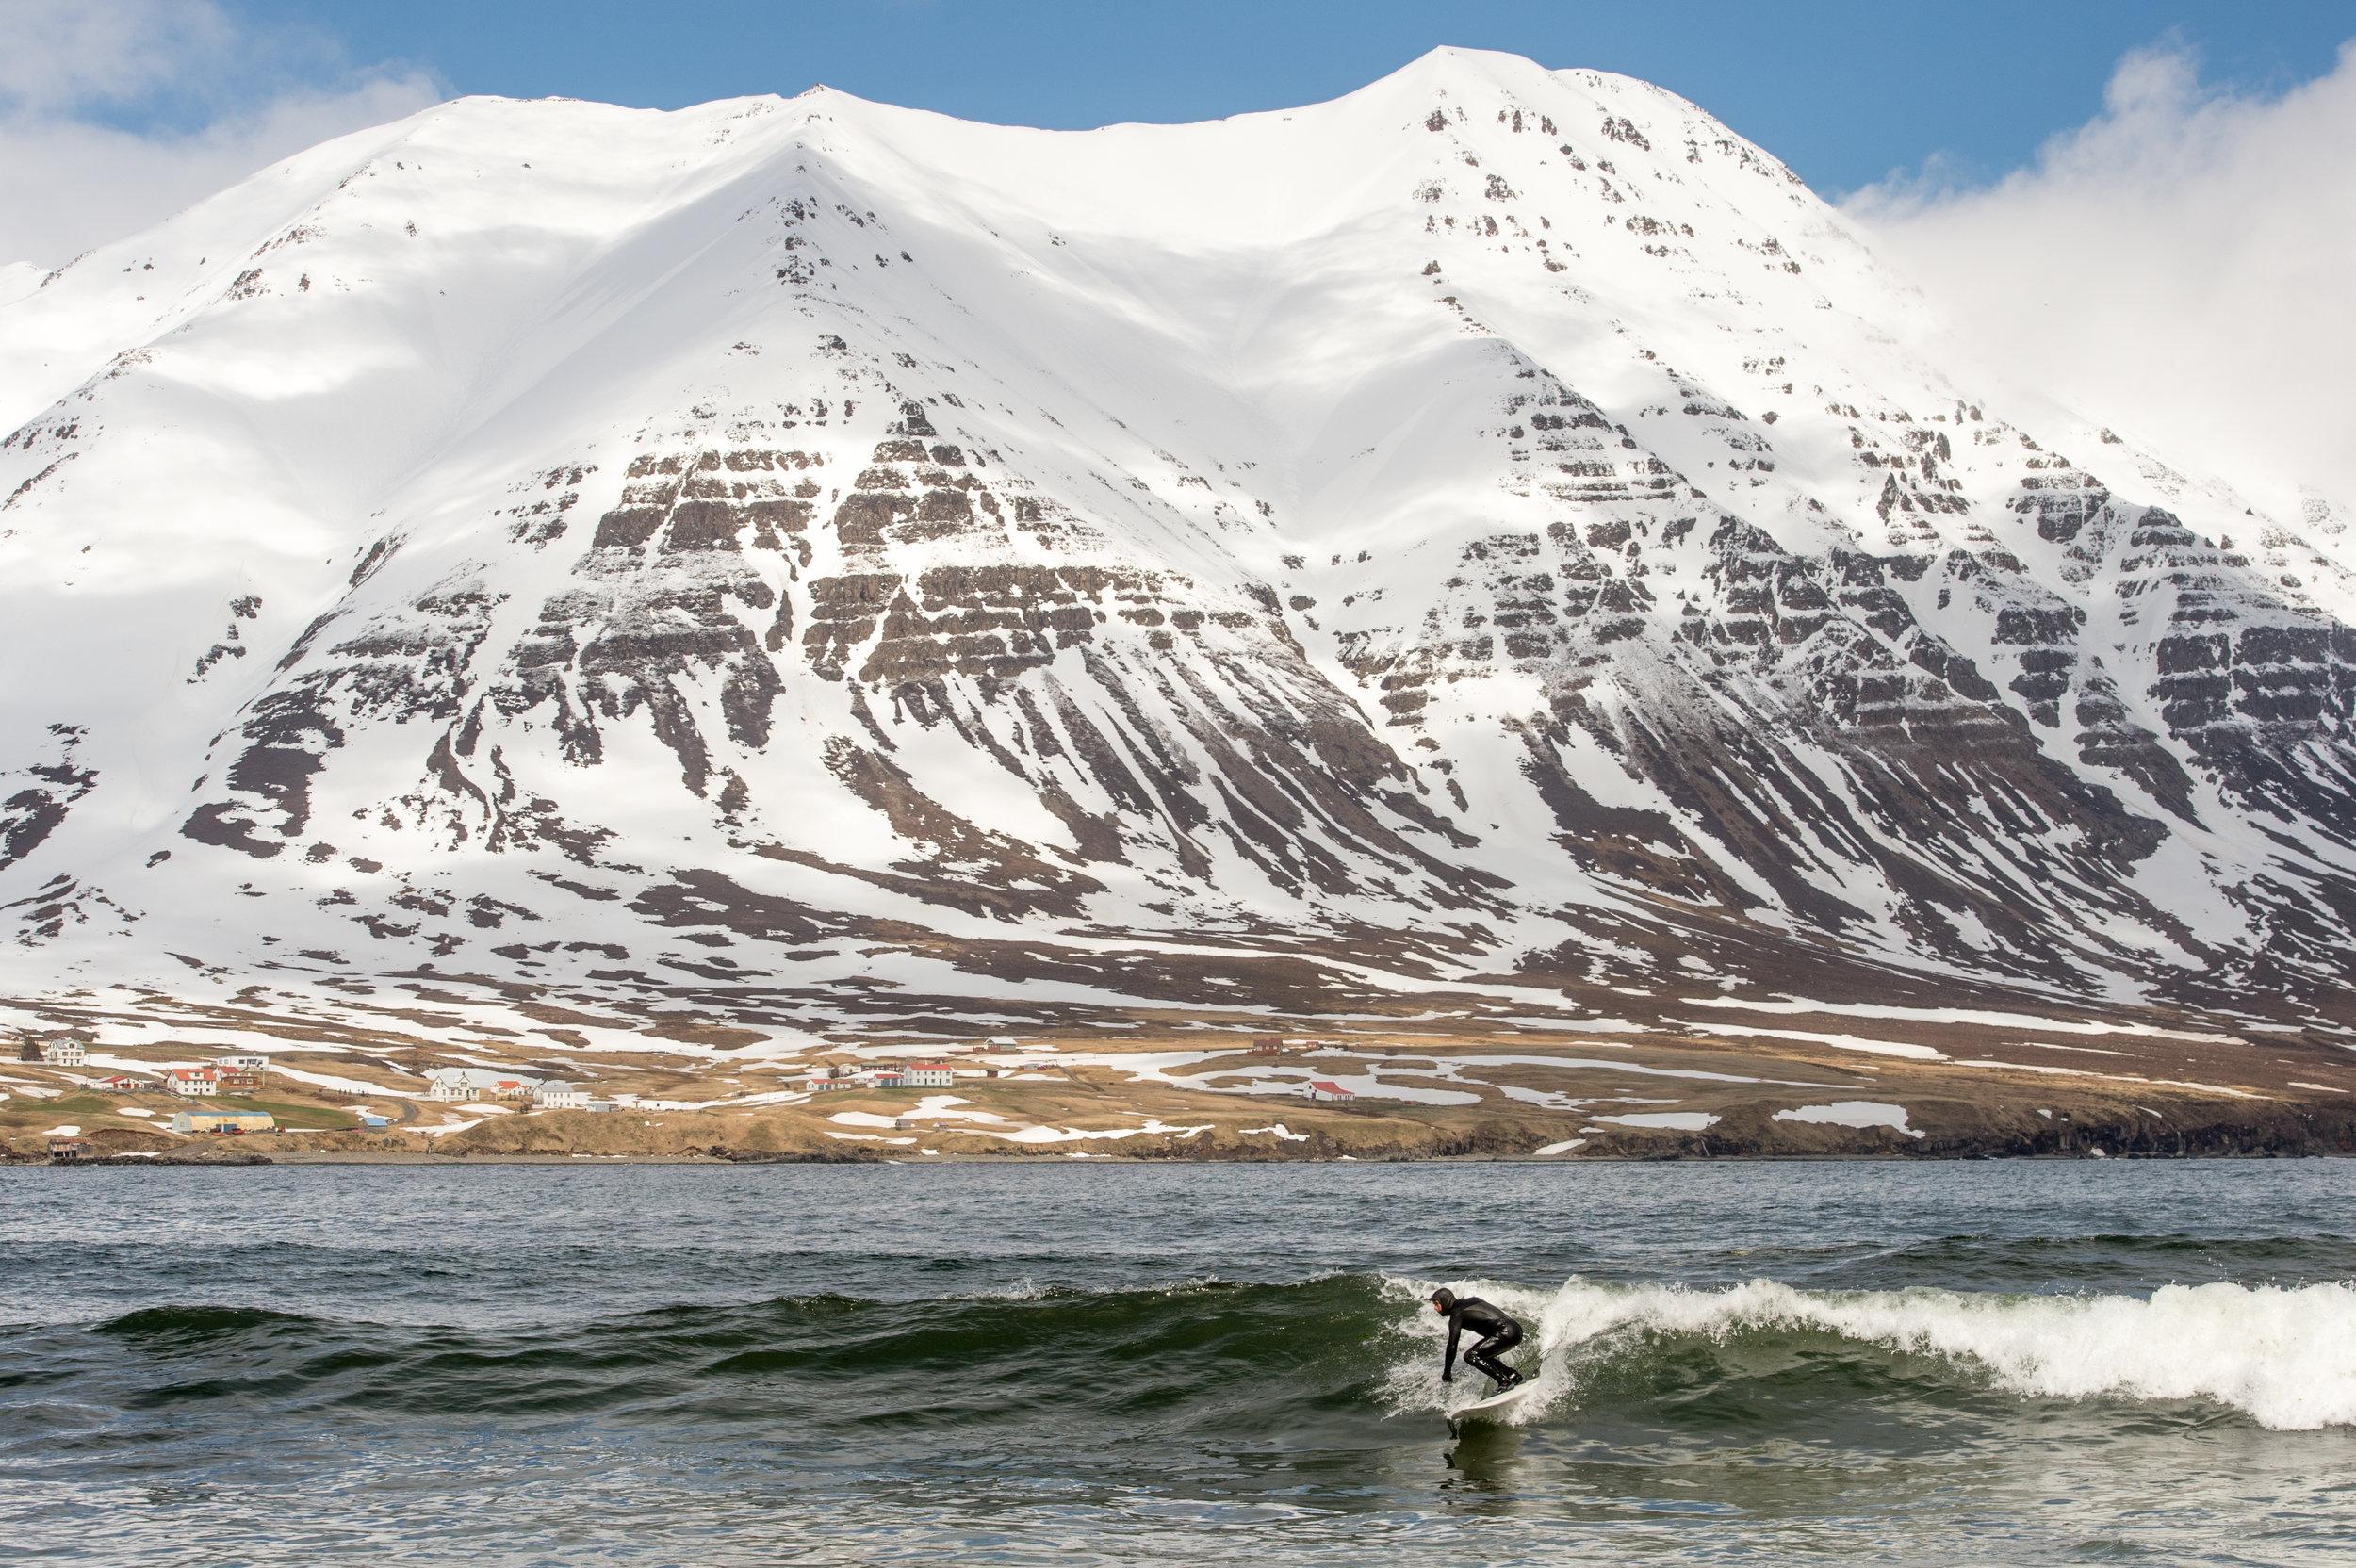 IcelandSurfing2015-6719.jpg